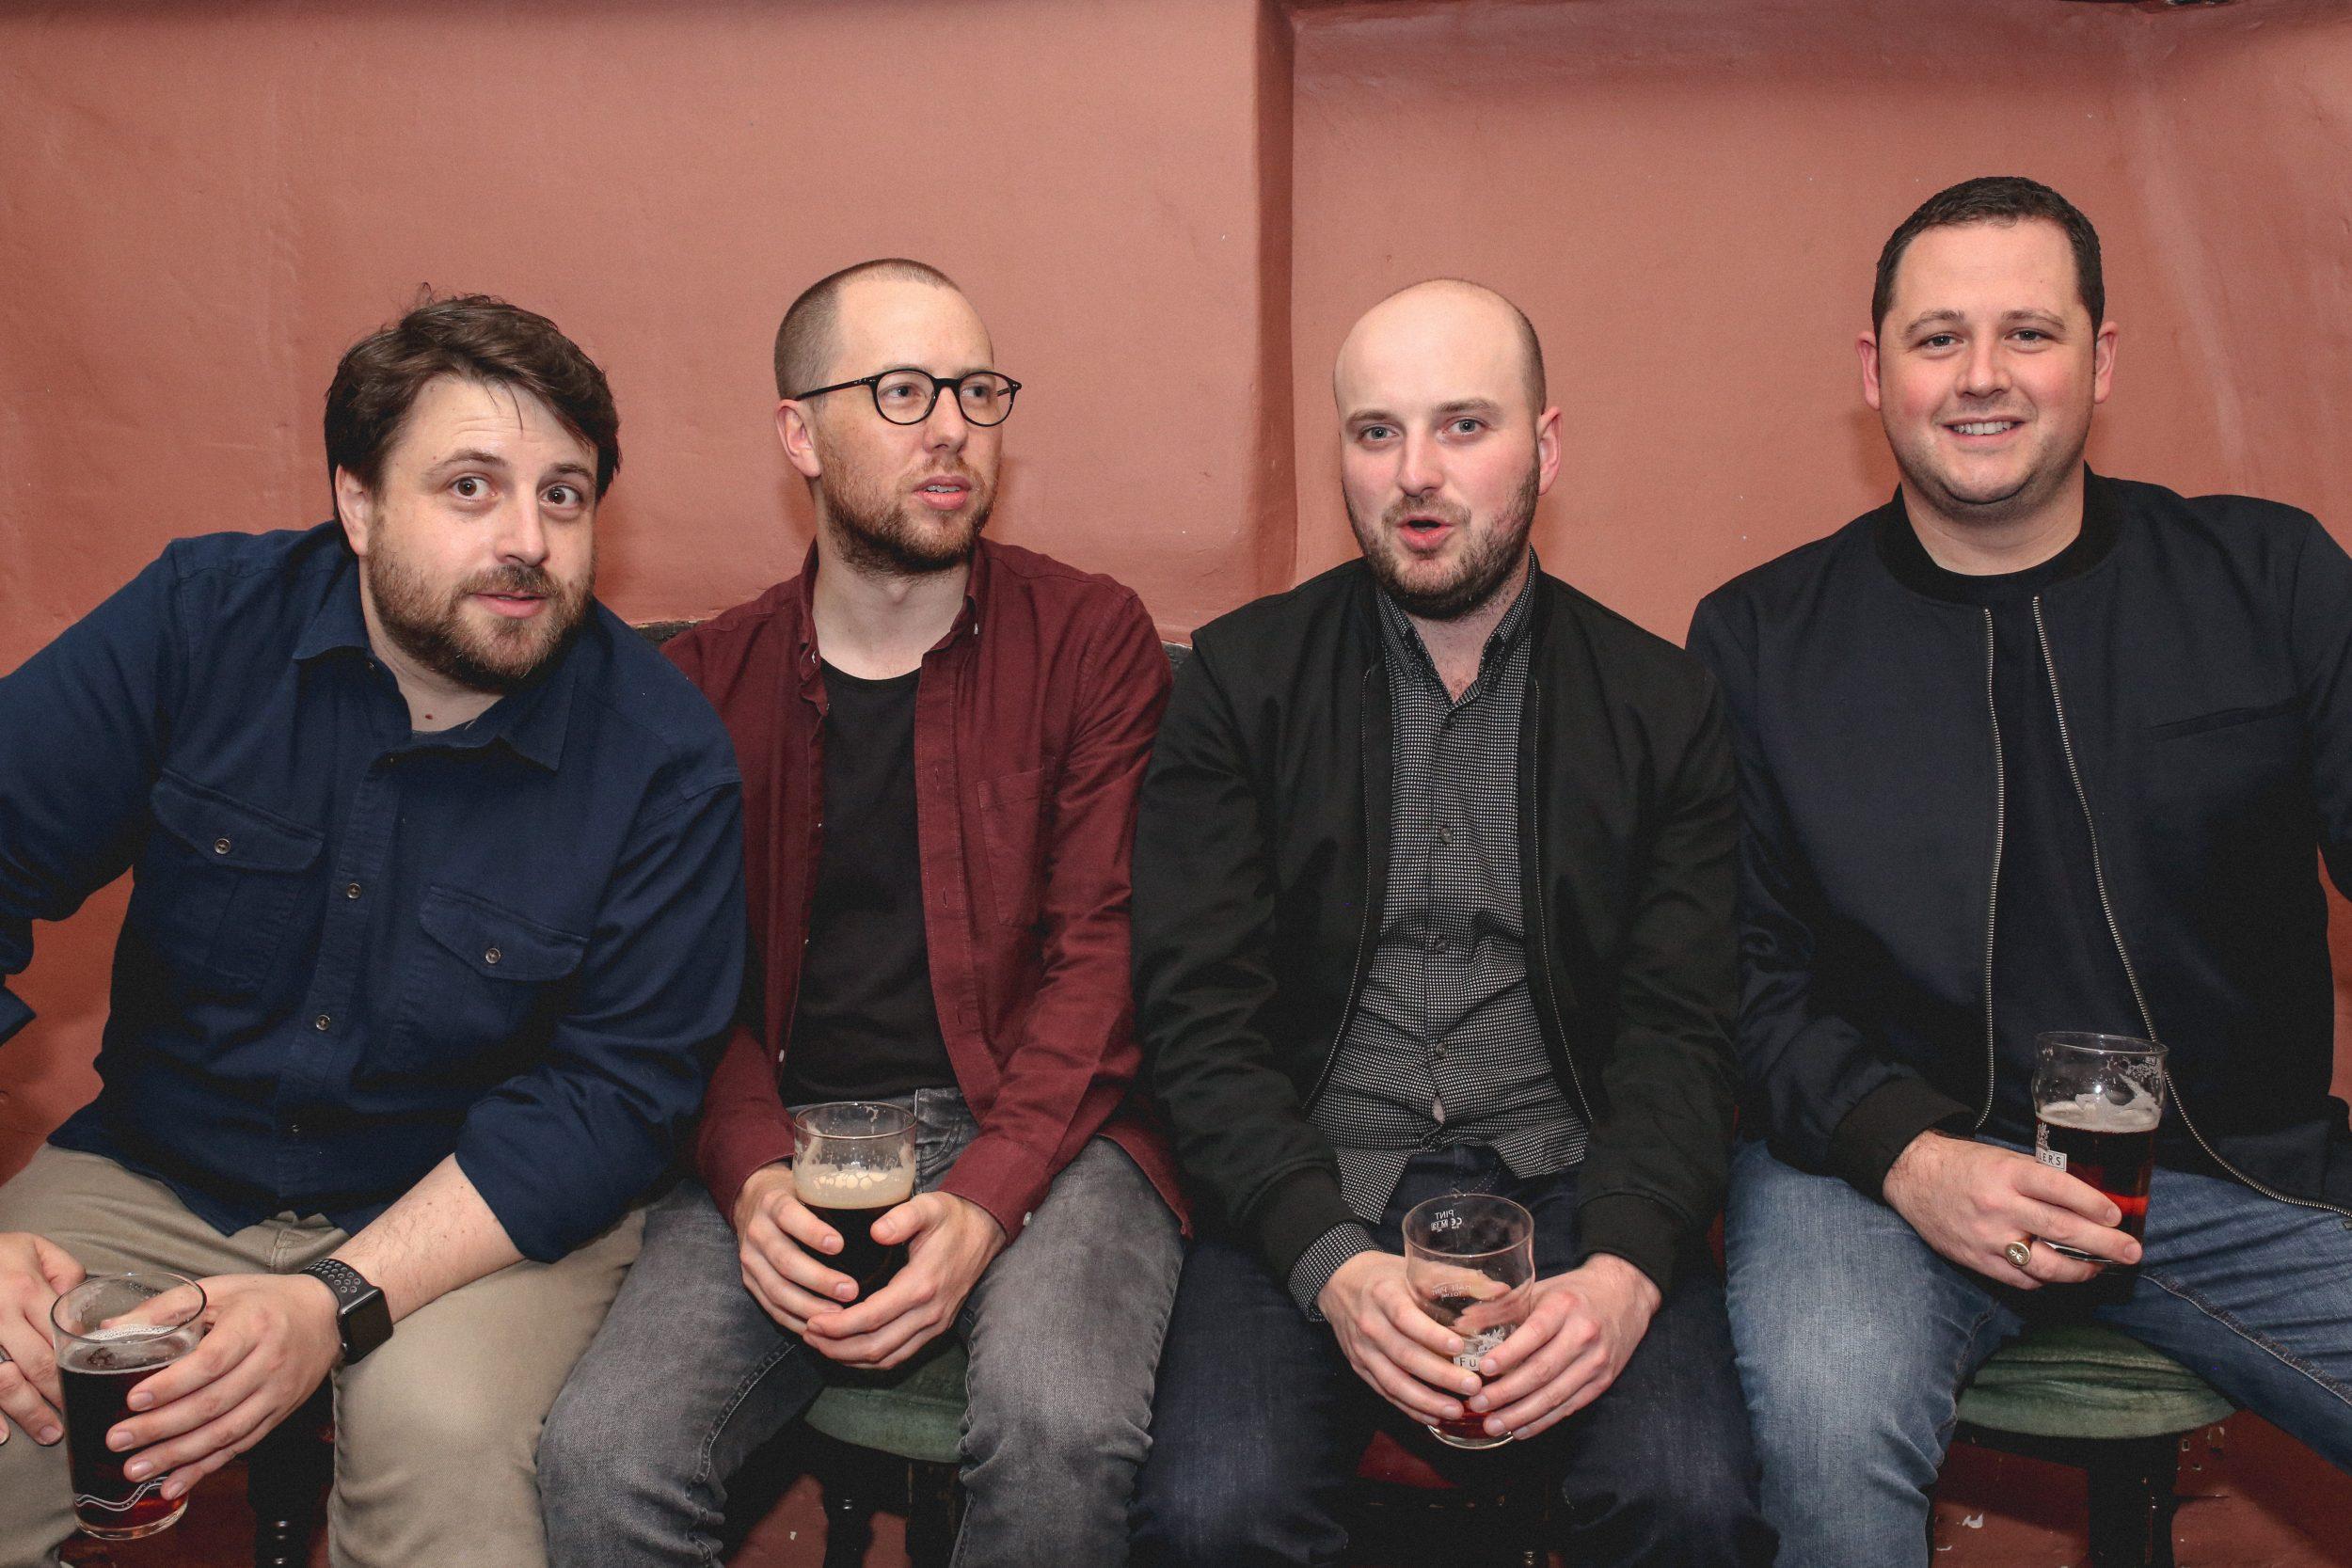 TGF Interview and Acoustic Peformance On Radio Verulam